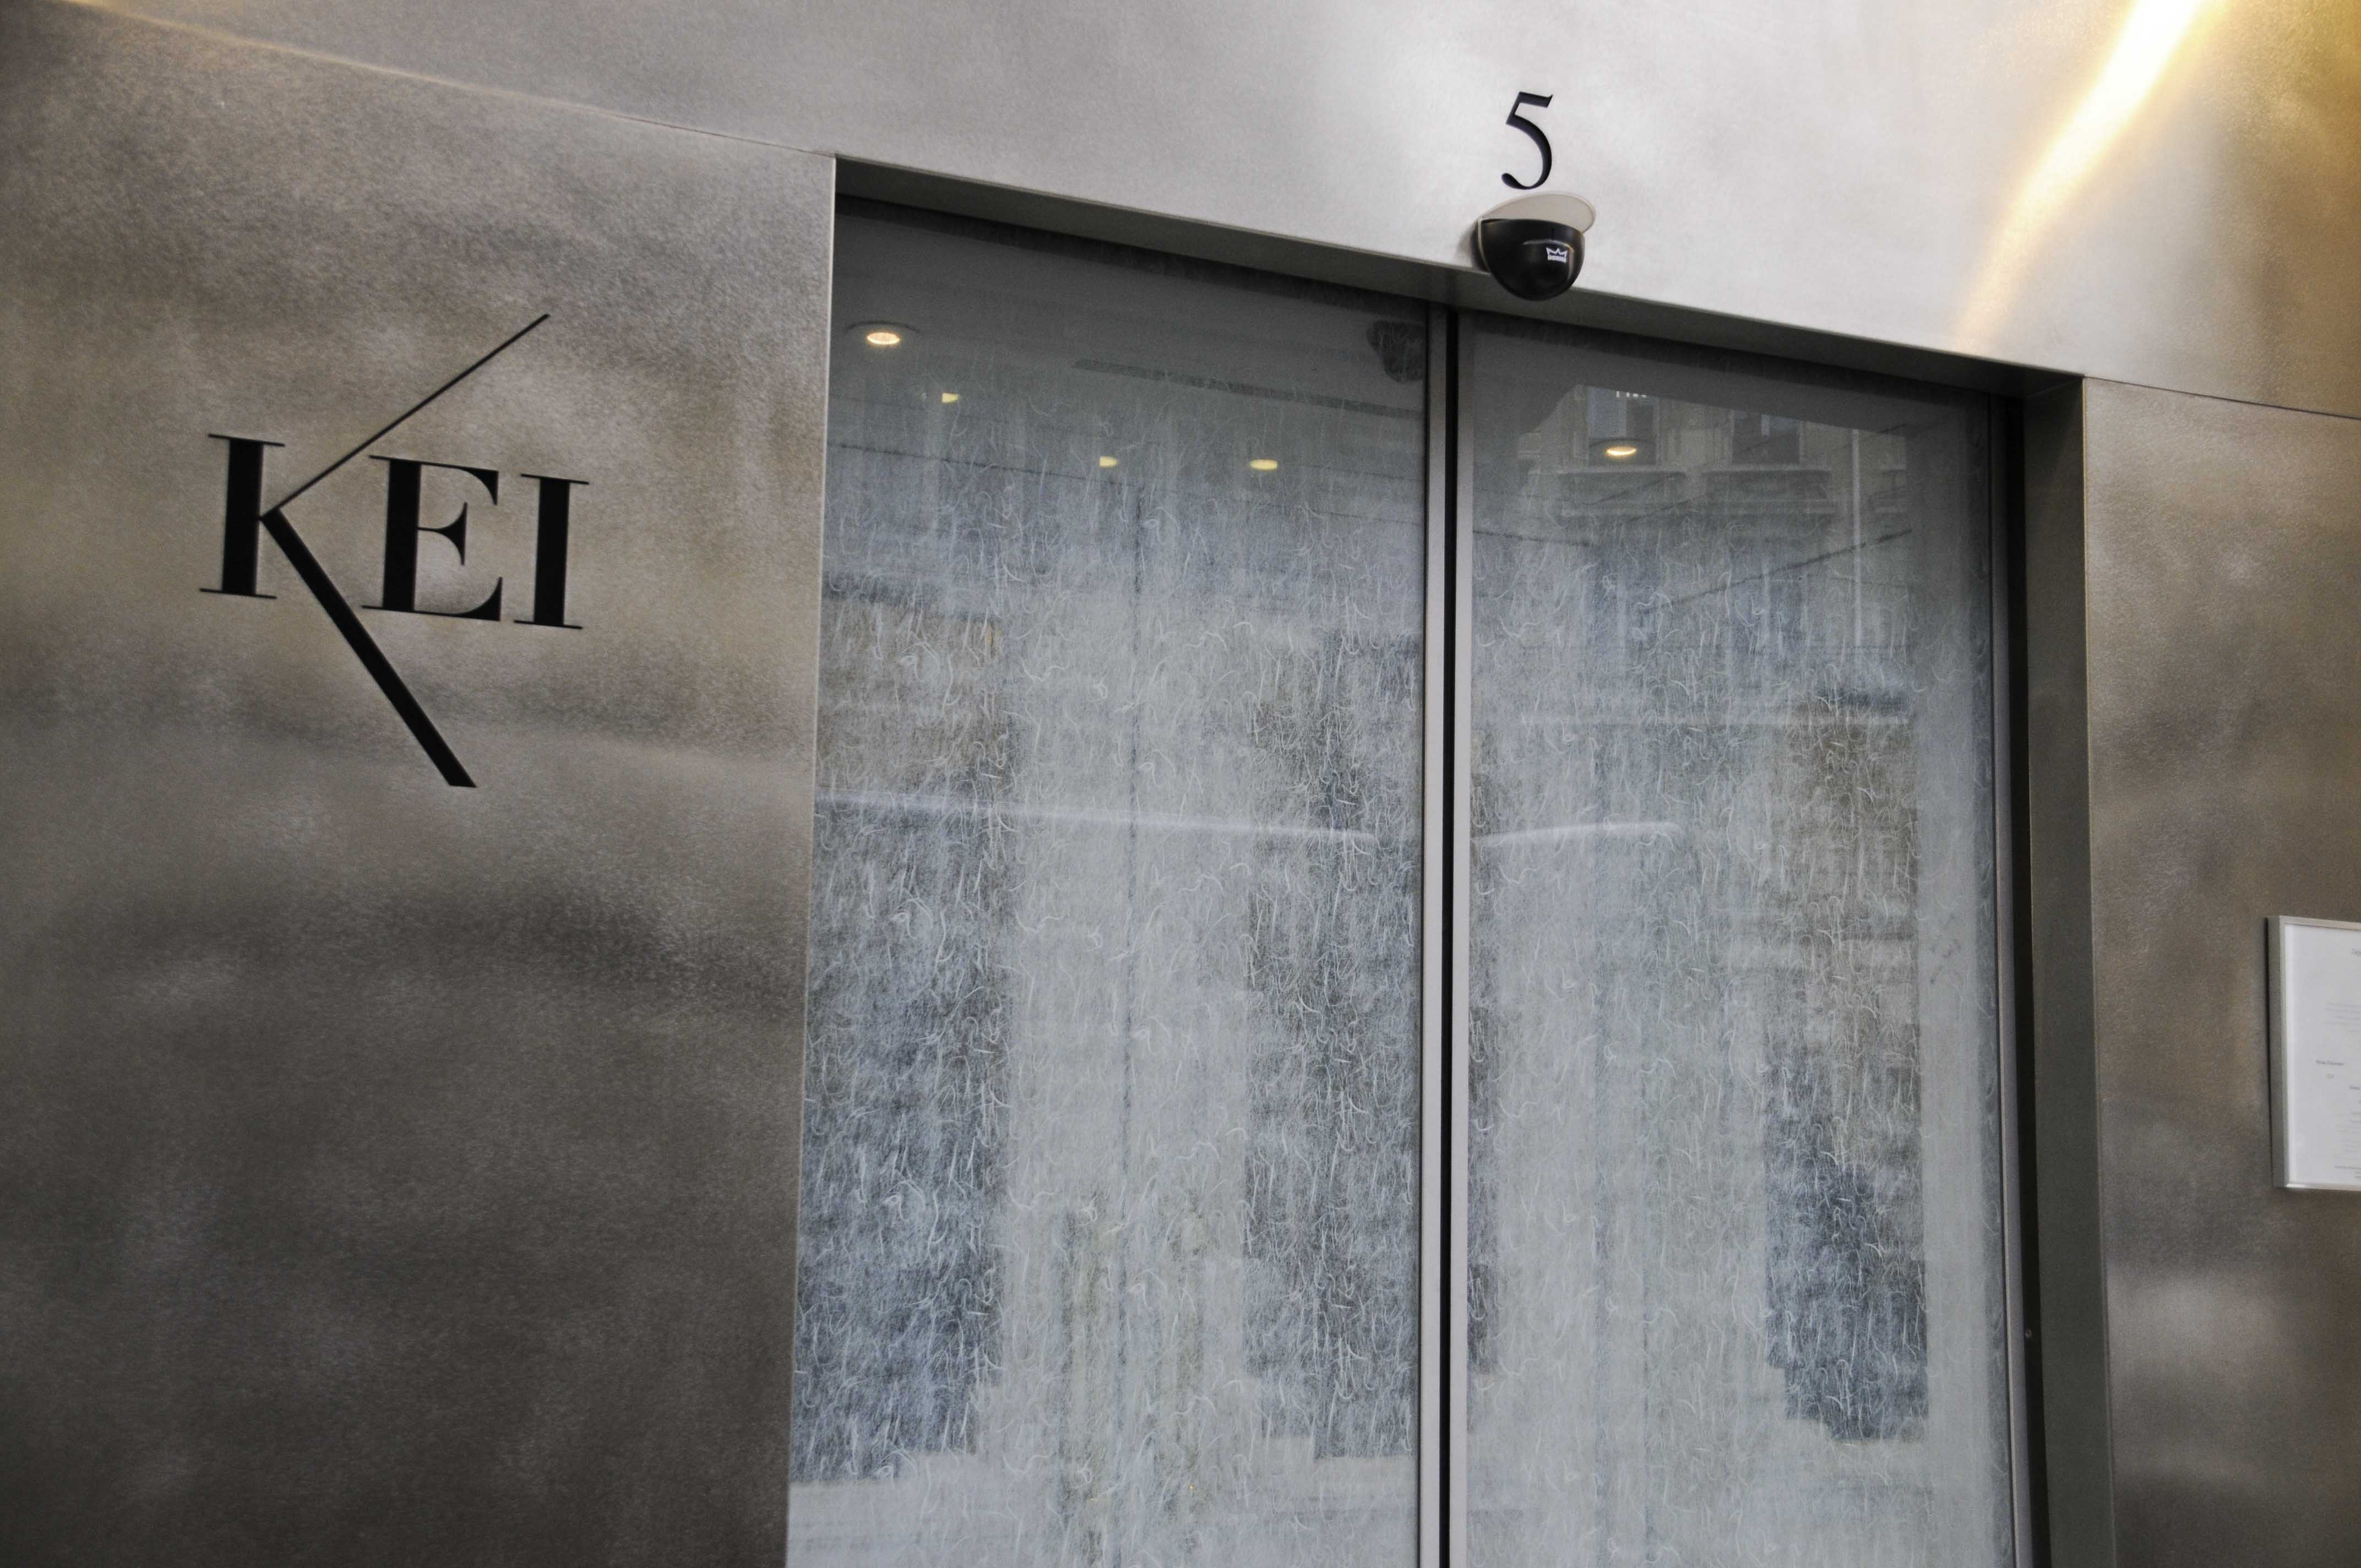 Kei restaurant (1)